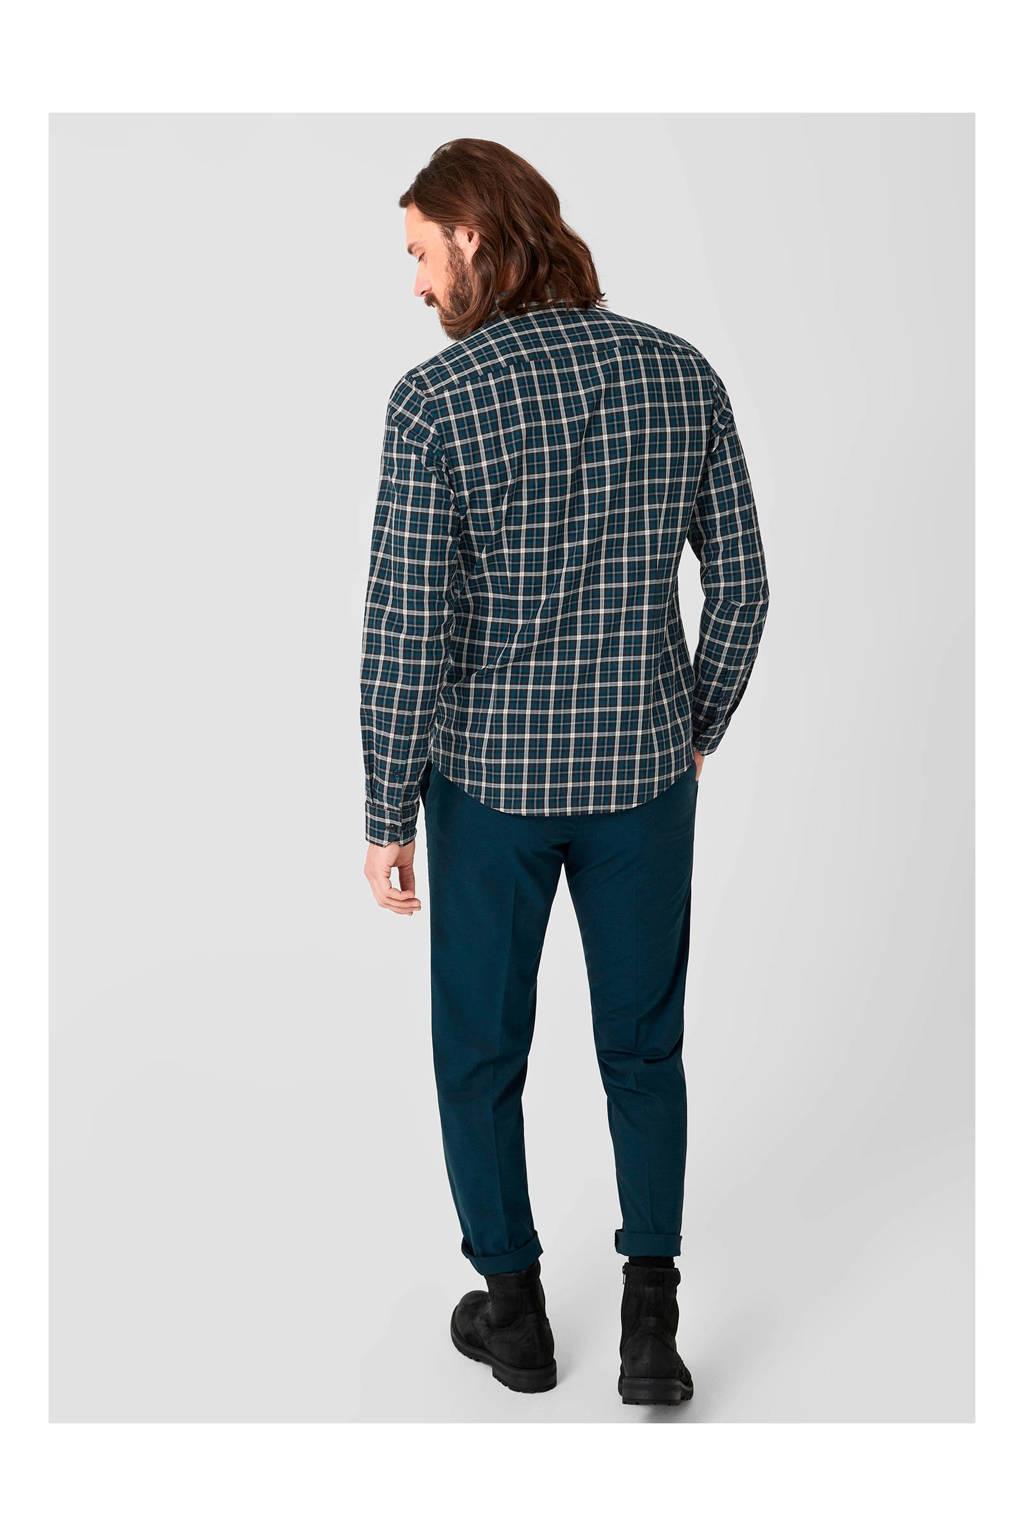 s.Oliver BLACK LABEL geruit slim fit overhemd blauw, Blauw